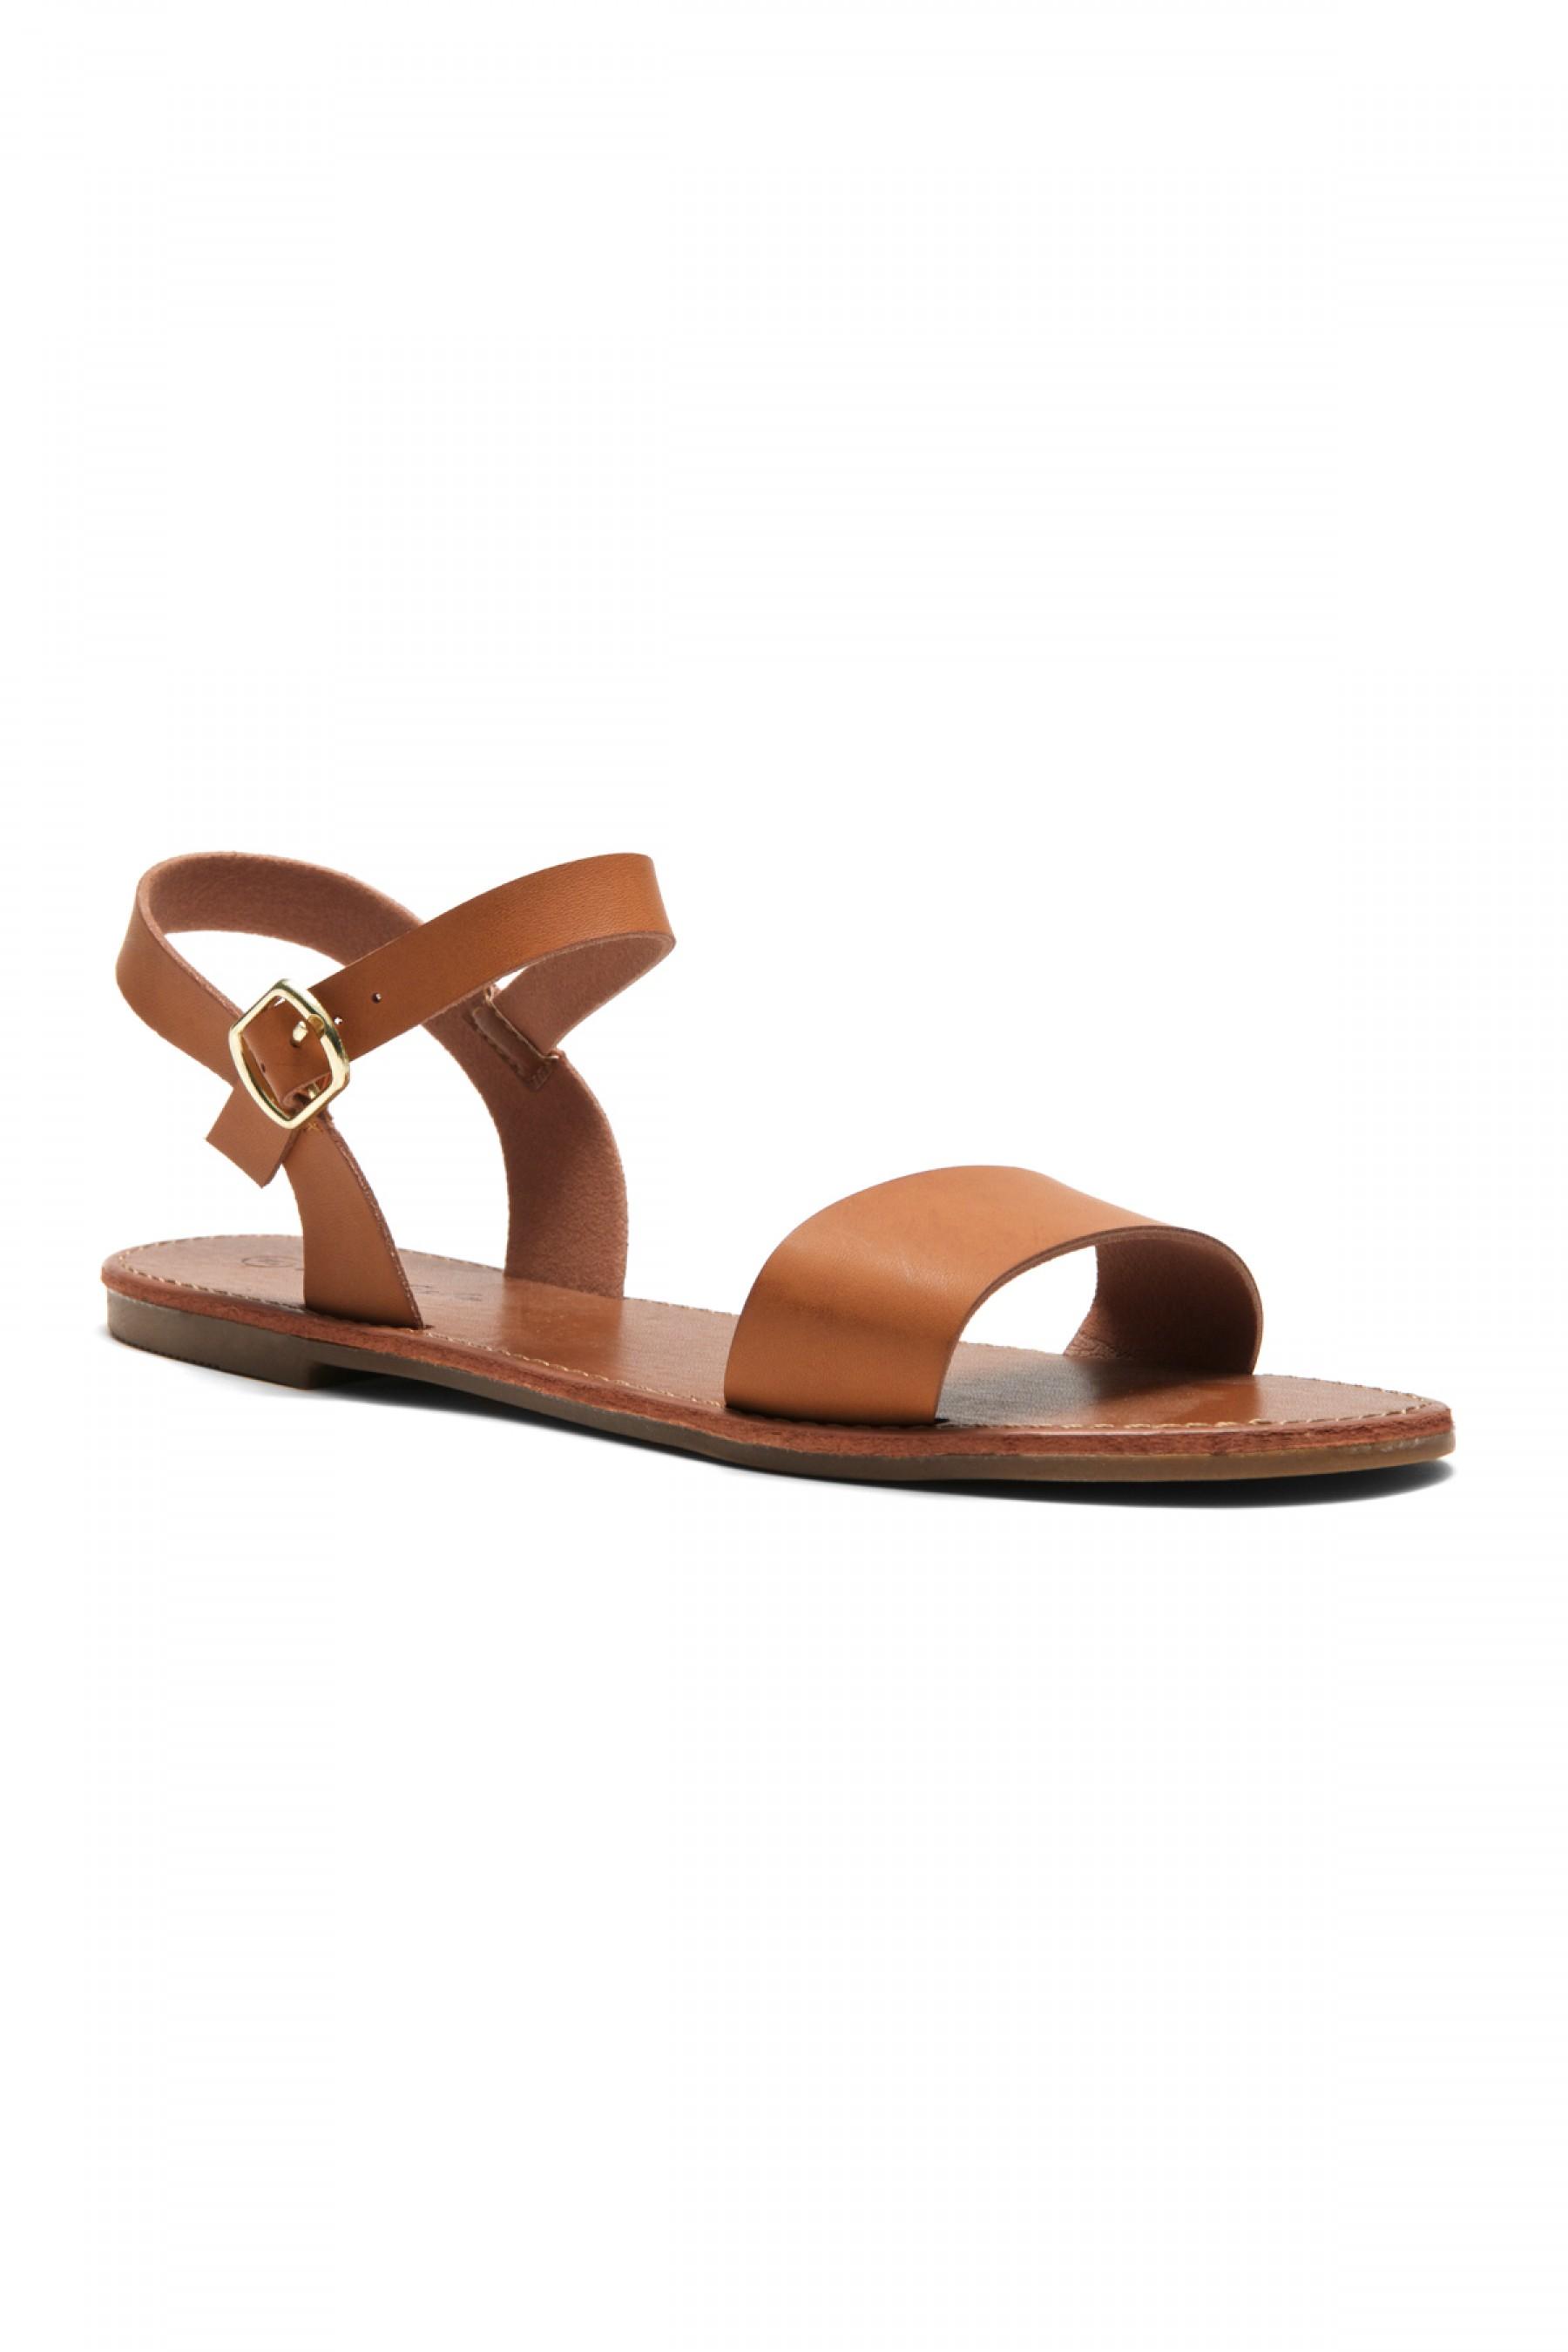 Women's Cognac Manmade Keetton Flat Sandal with Faux Leather Straps